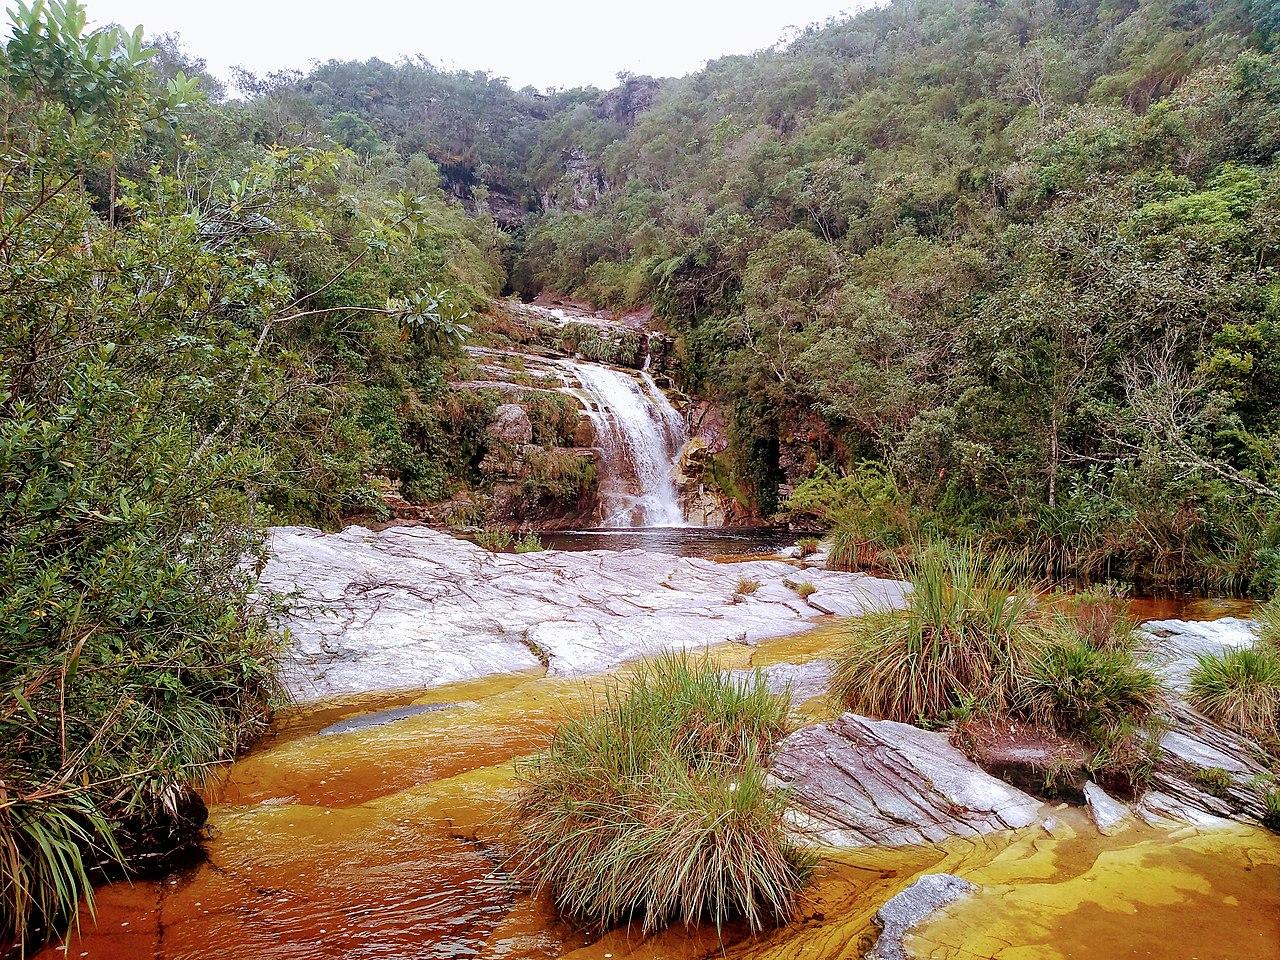 Cachoeira no Parque Estadual do Ibitipoca / Post Airbnb em Ibitipoca